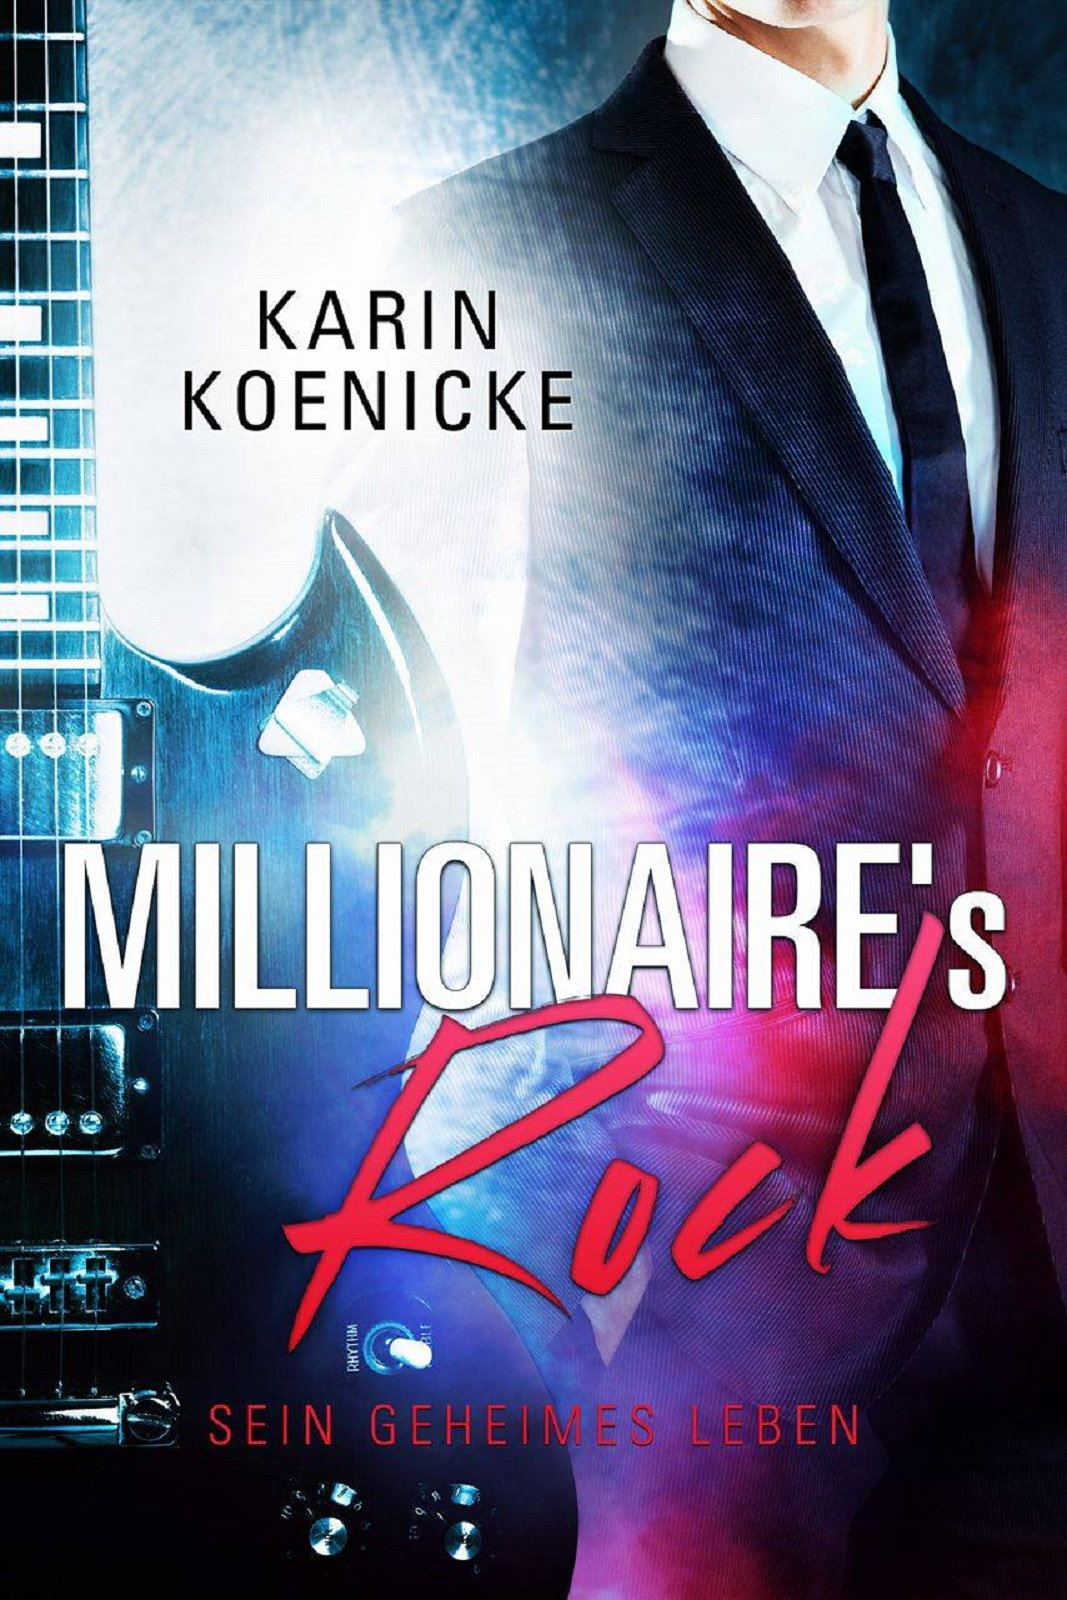 Millionaires Rock Cover